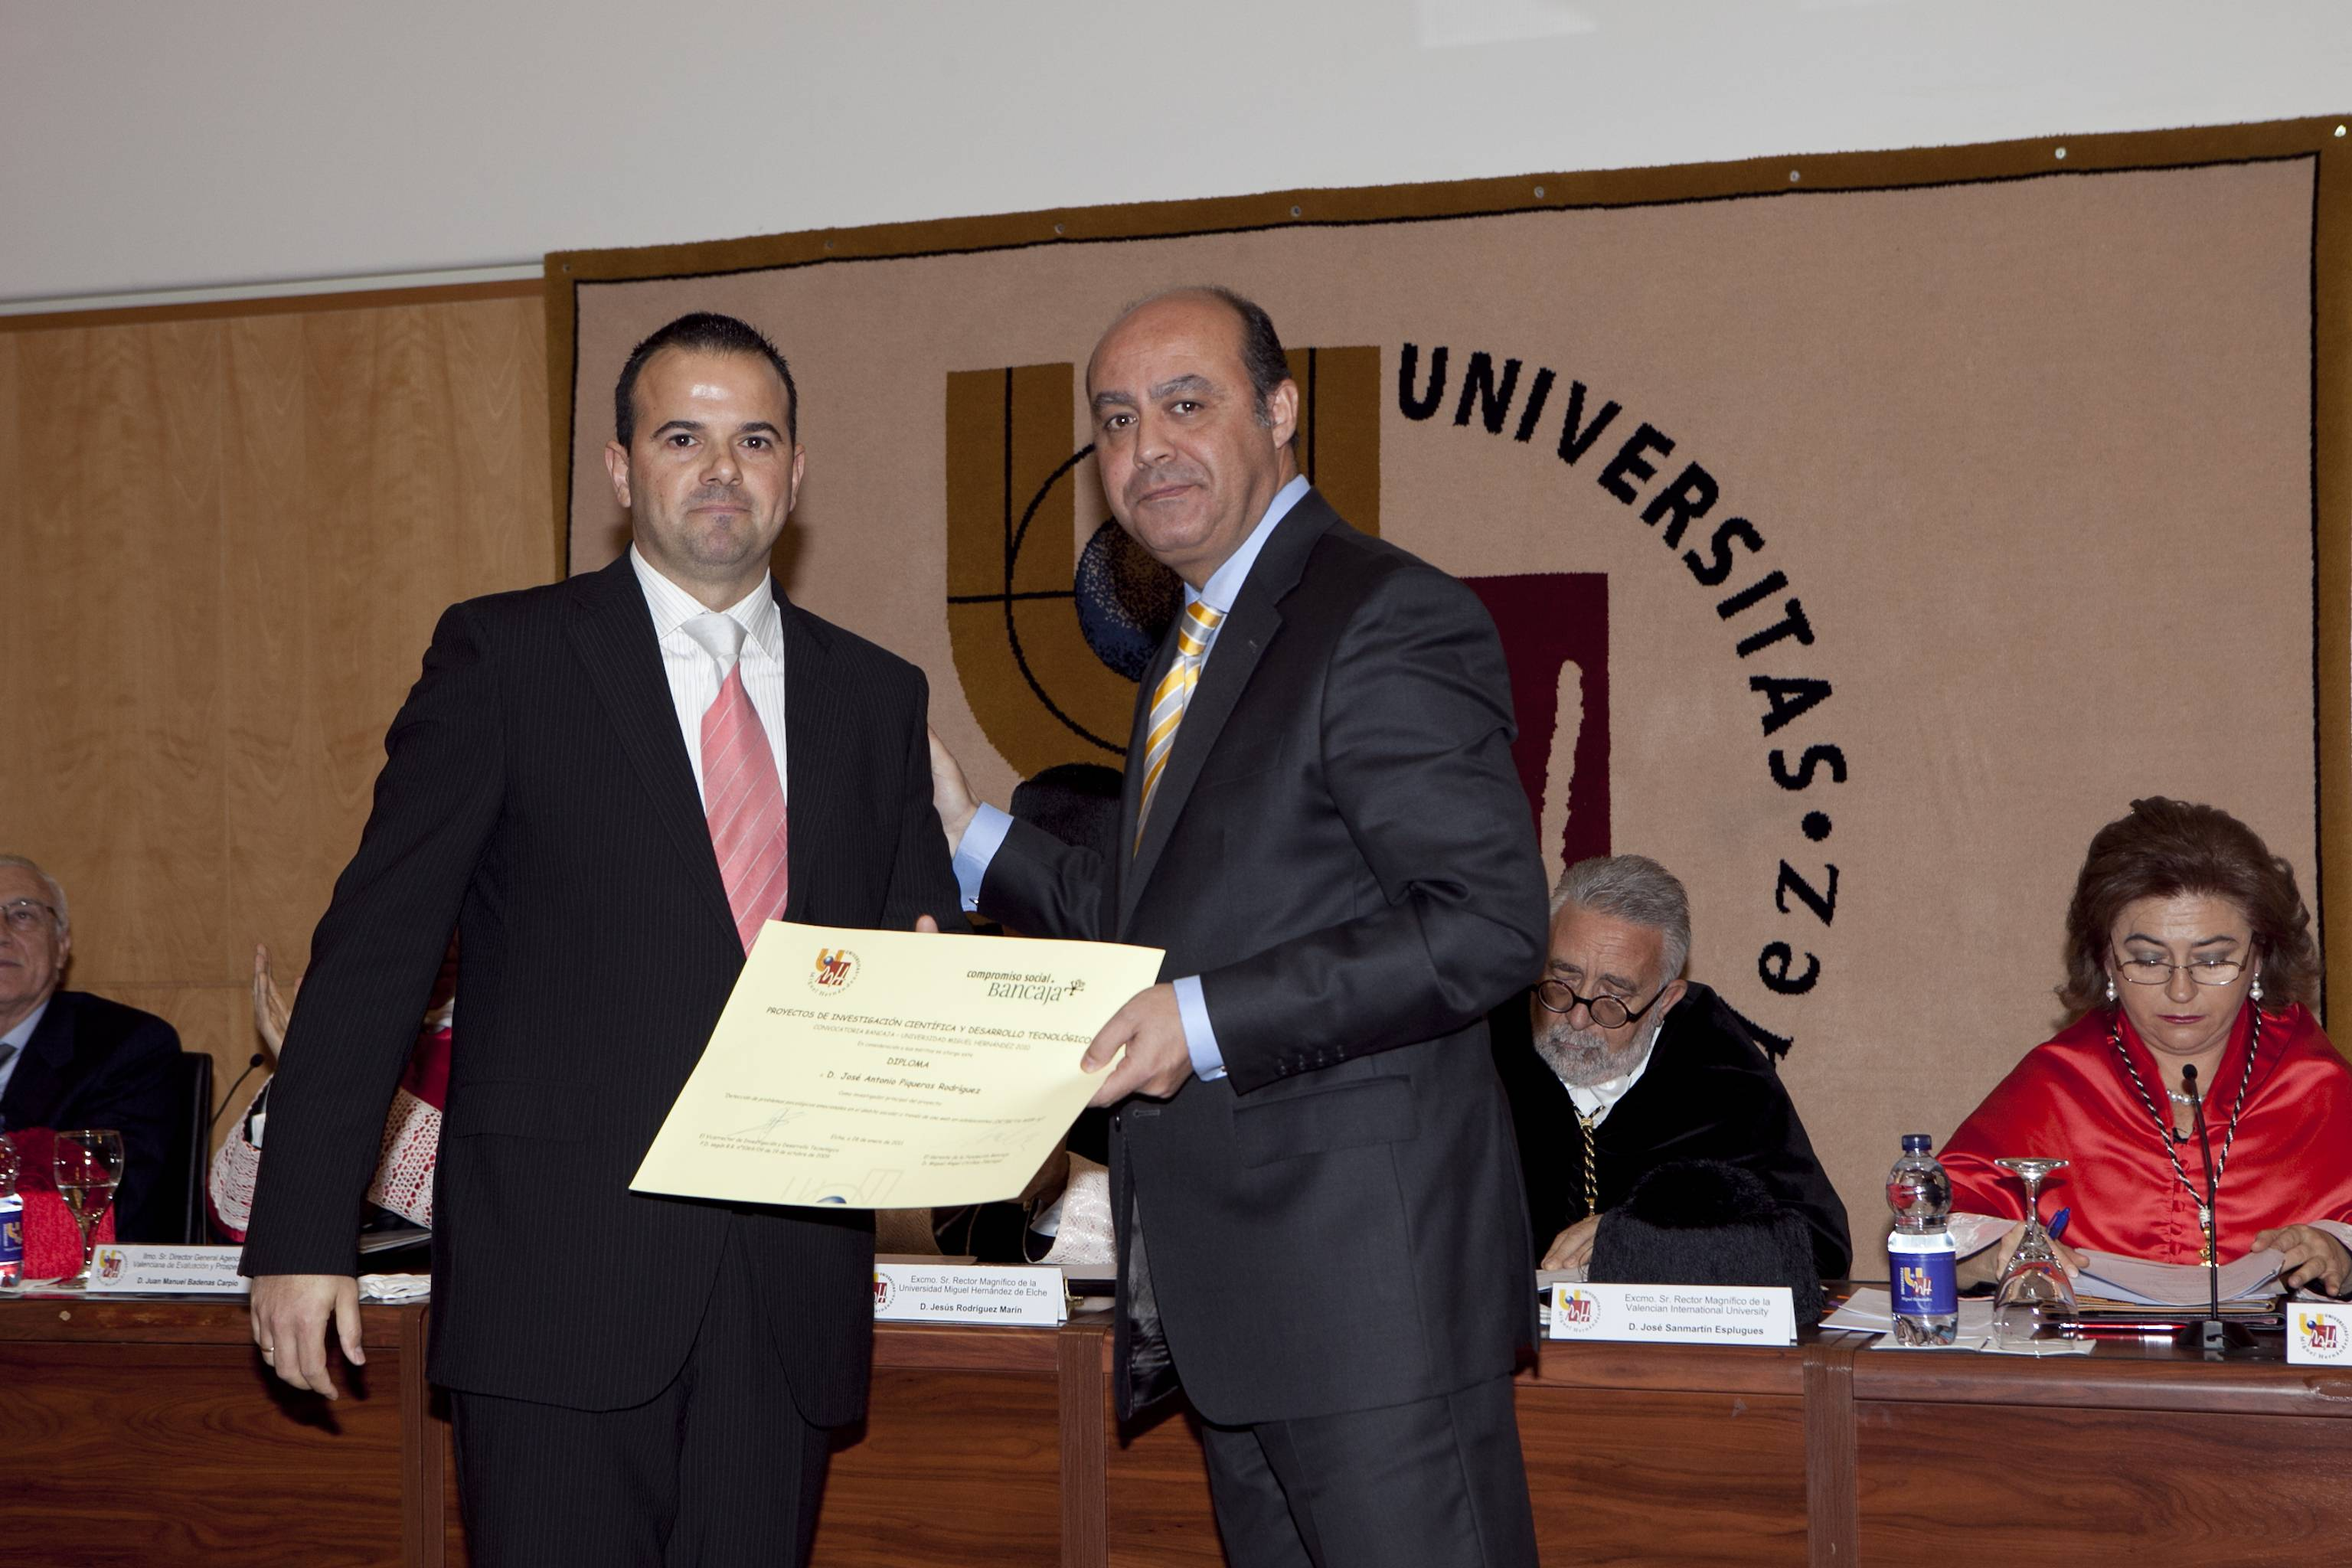 doctor-honoris-causa-luis-gamir_mg_1029.jpg